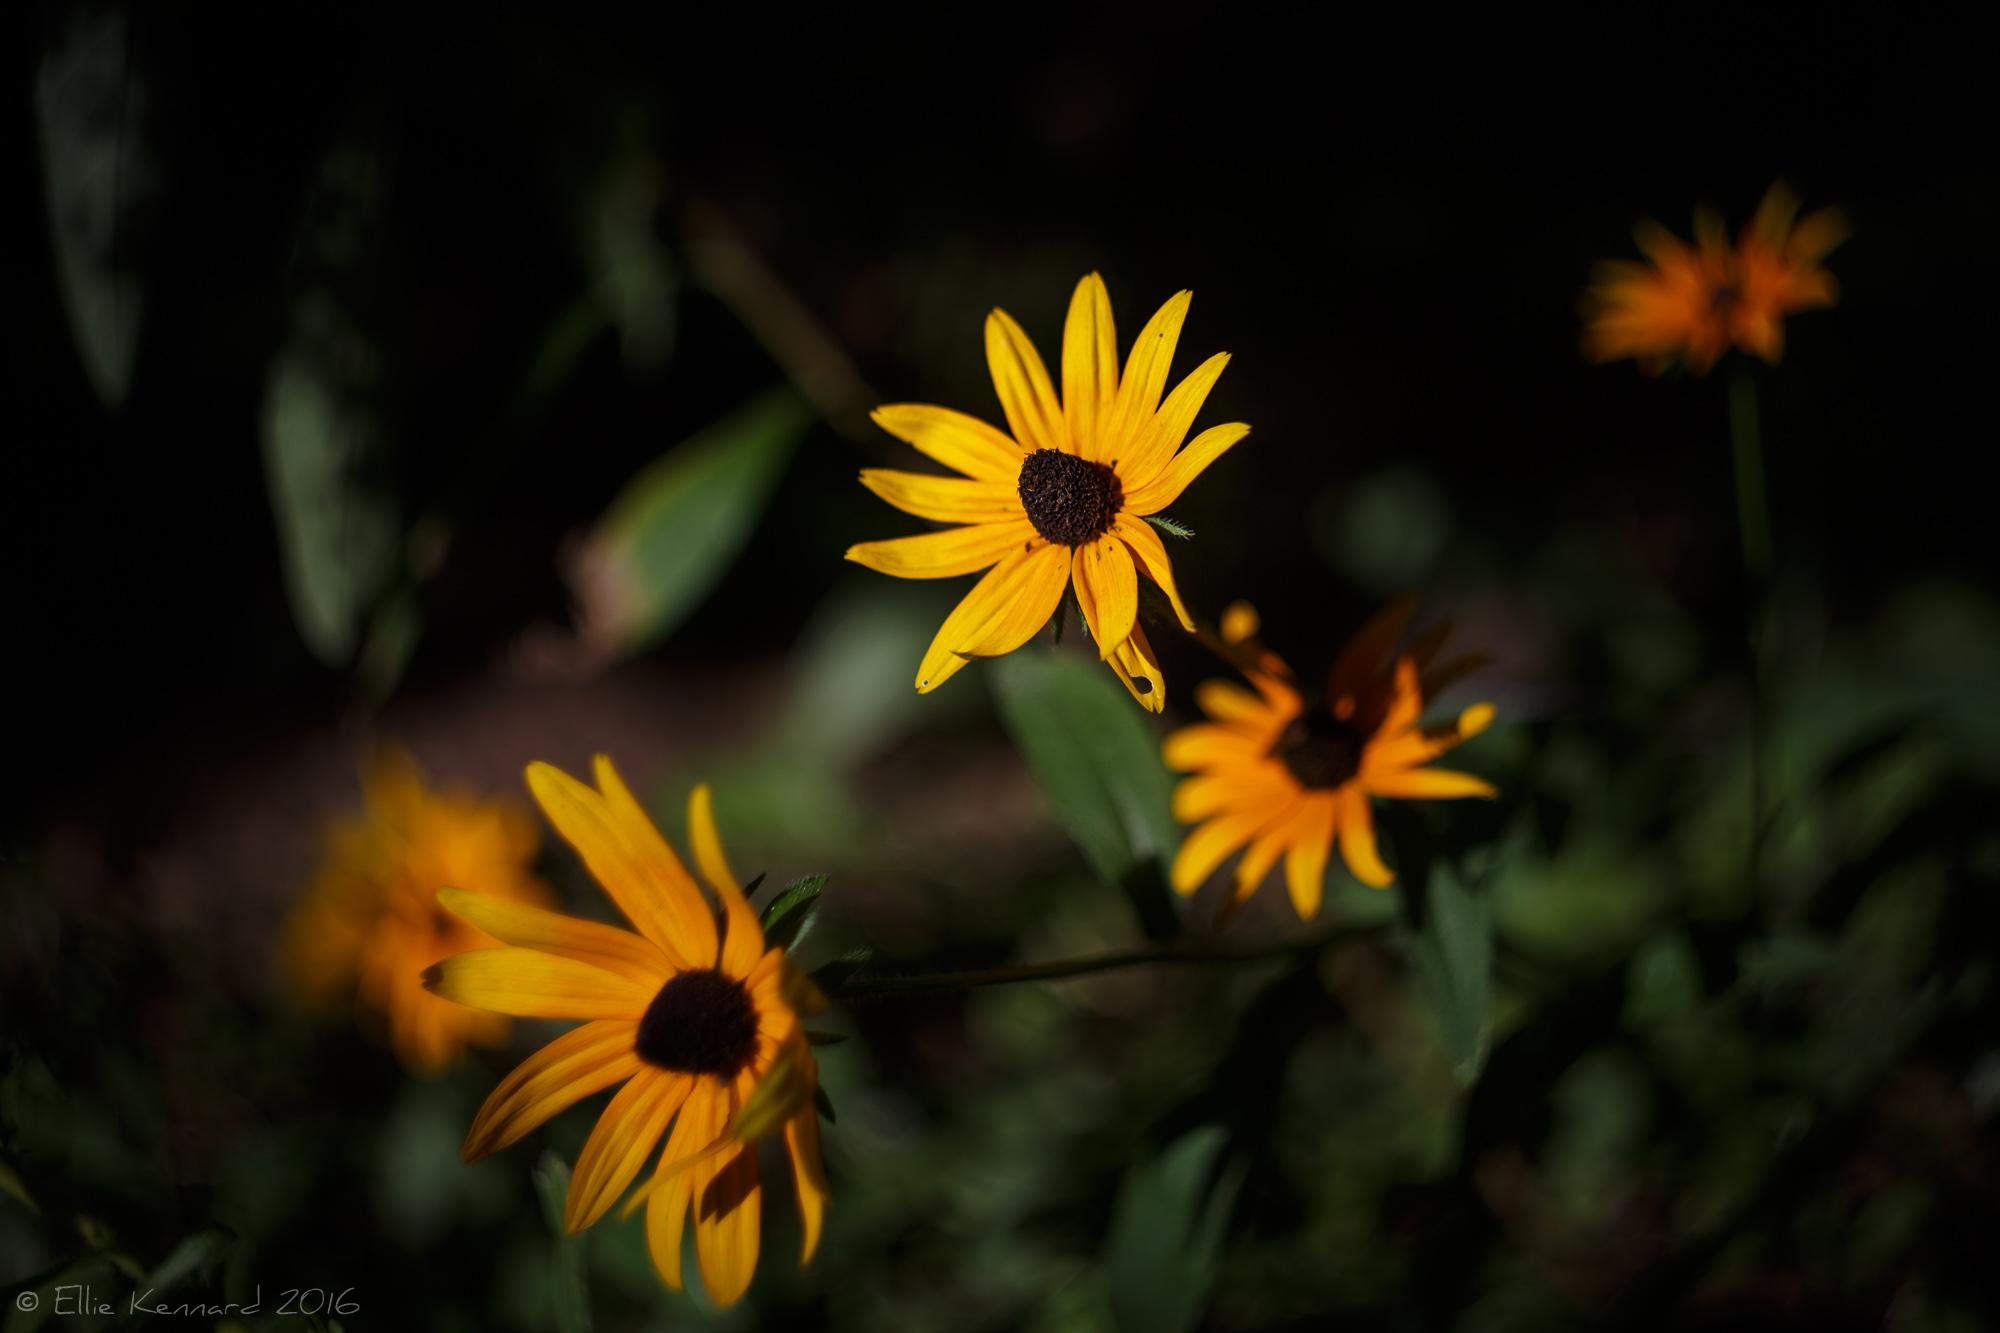 Black-Eyed Susans (Rudbeckia_hirta) lighting up the undergrowth - Ellie Kennard 2016